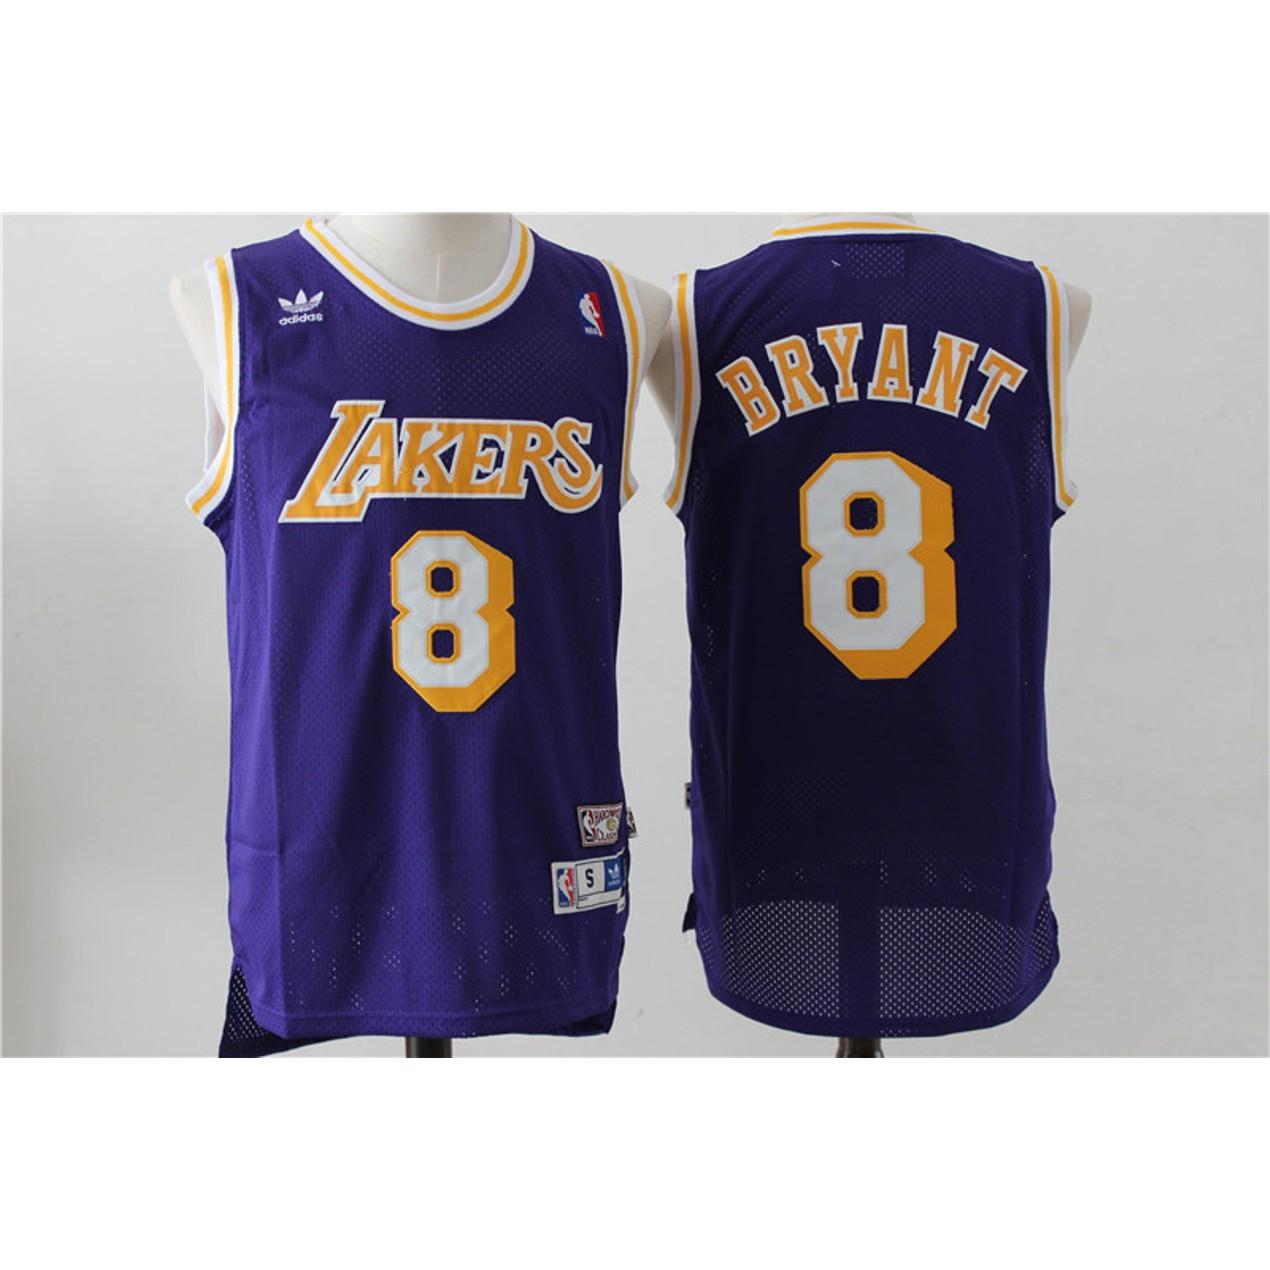 size 40 9ad49 82264 Los Angeles Lakers #8 Kobe Bryant Purple Throwback ...